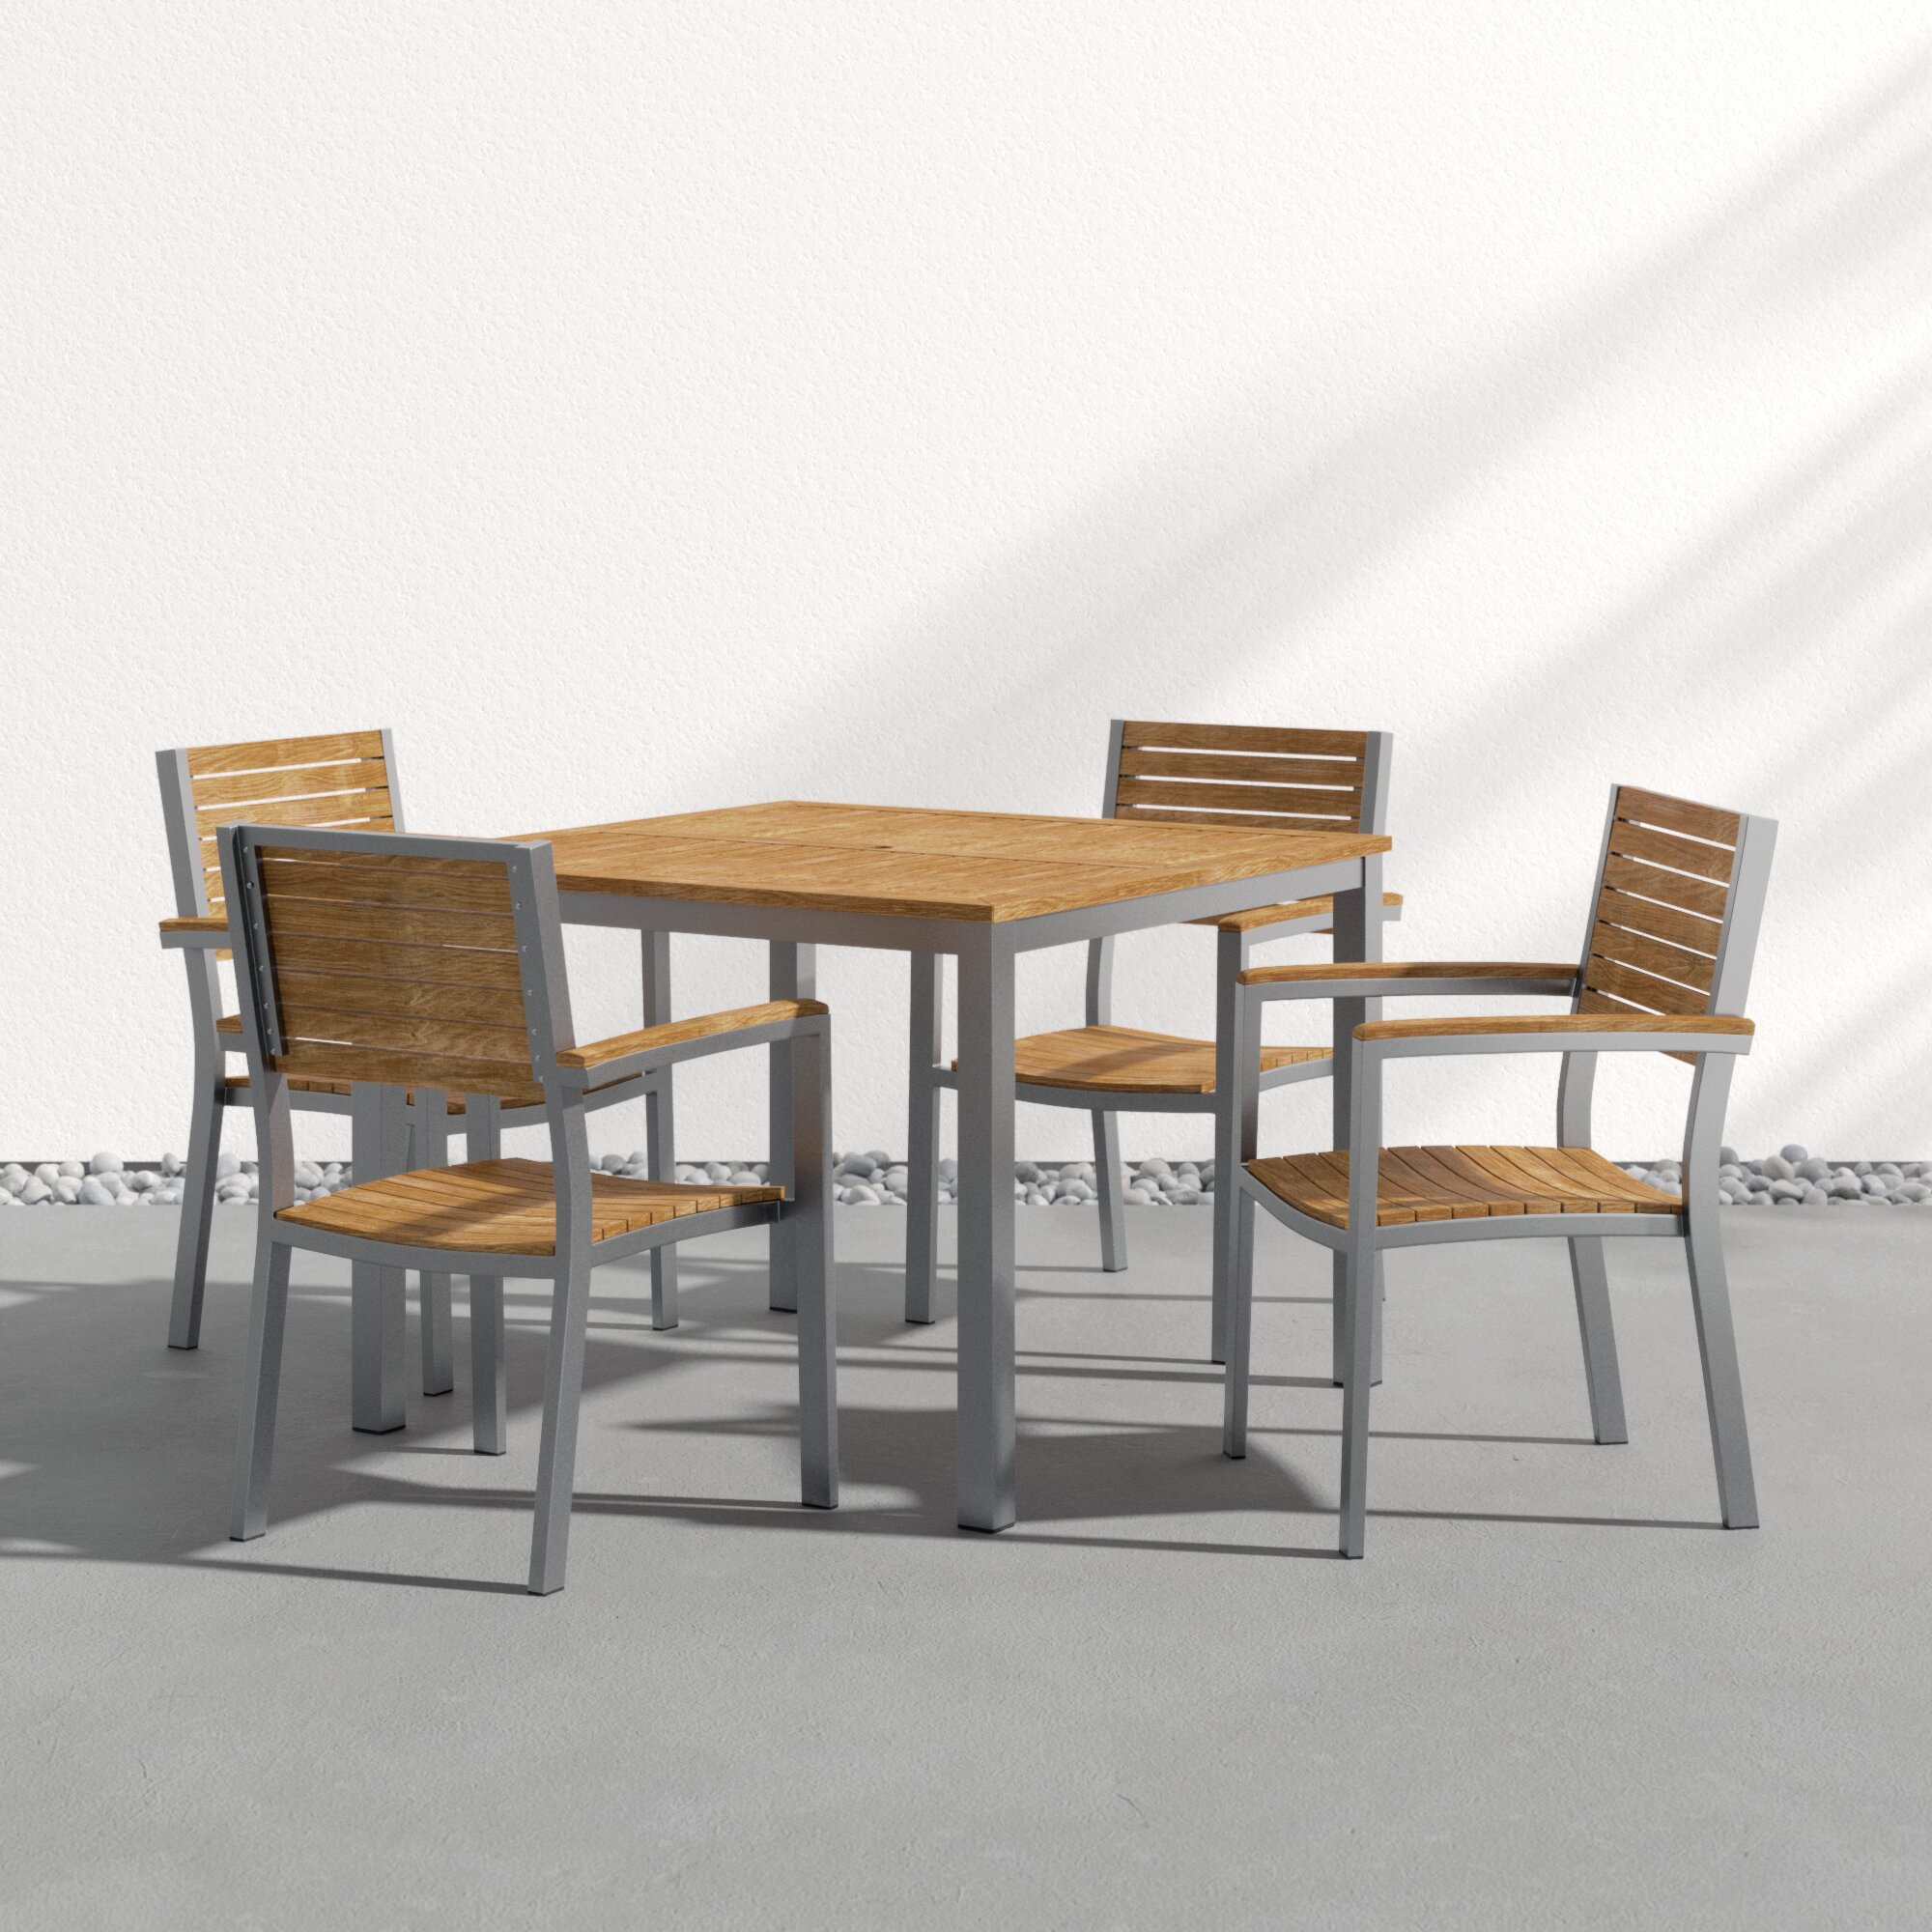 Sol 72 Outdoor Caspian 5 Piece Dining Set Reviews Wayfair